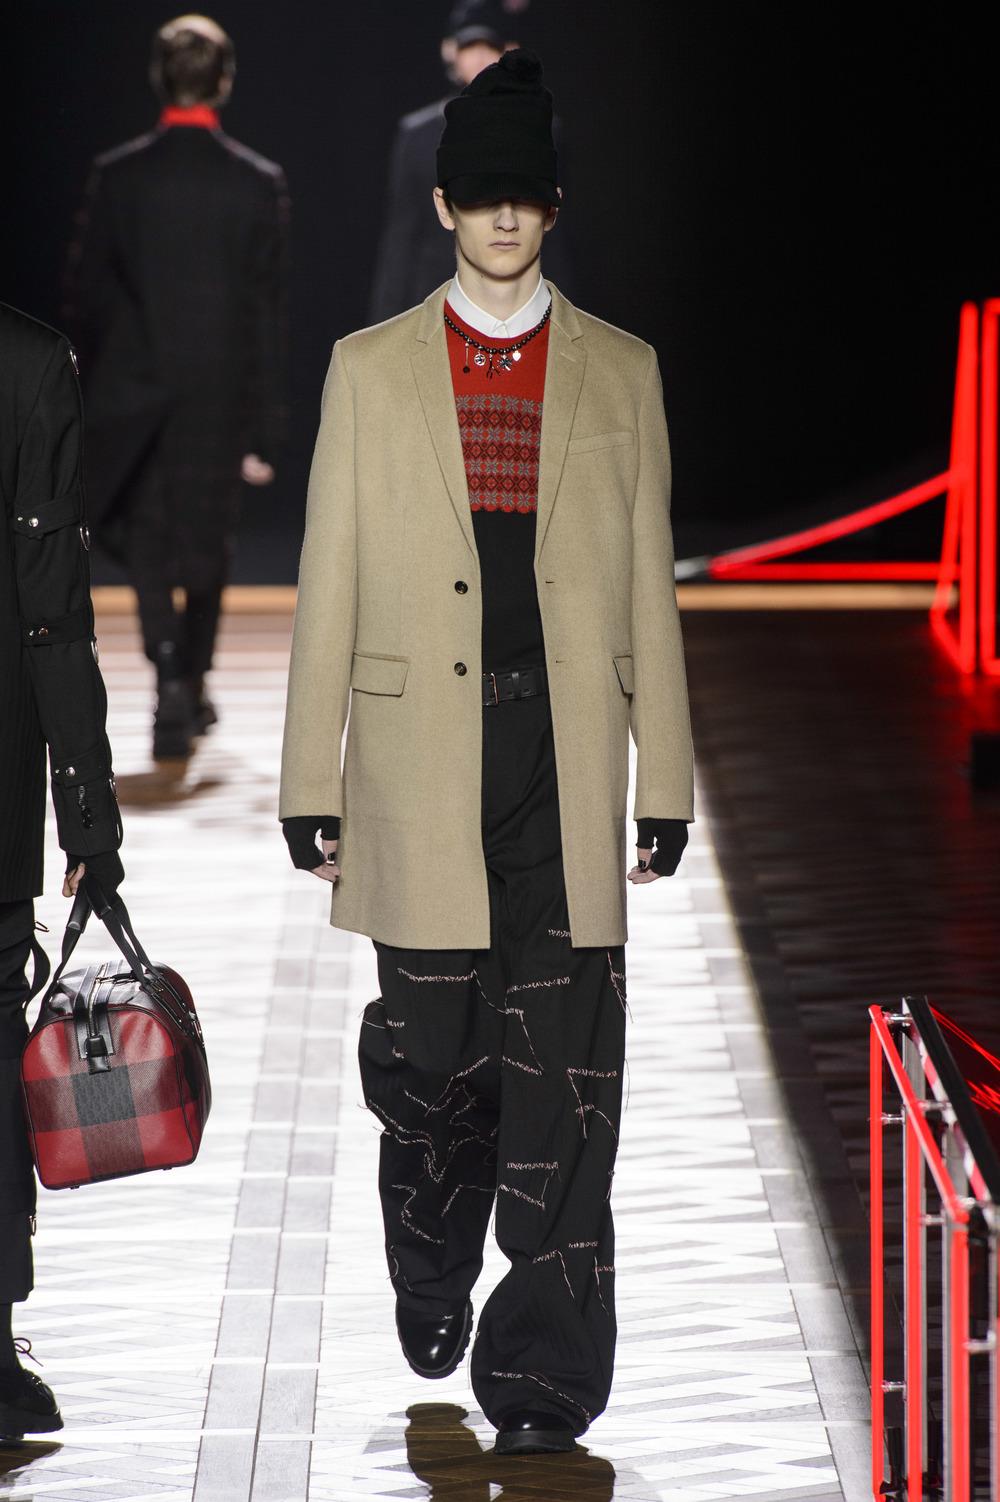 Dior_Homme_Hiver2016-17_look_26.JPG